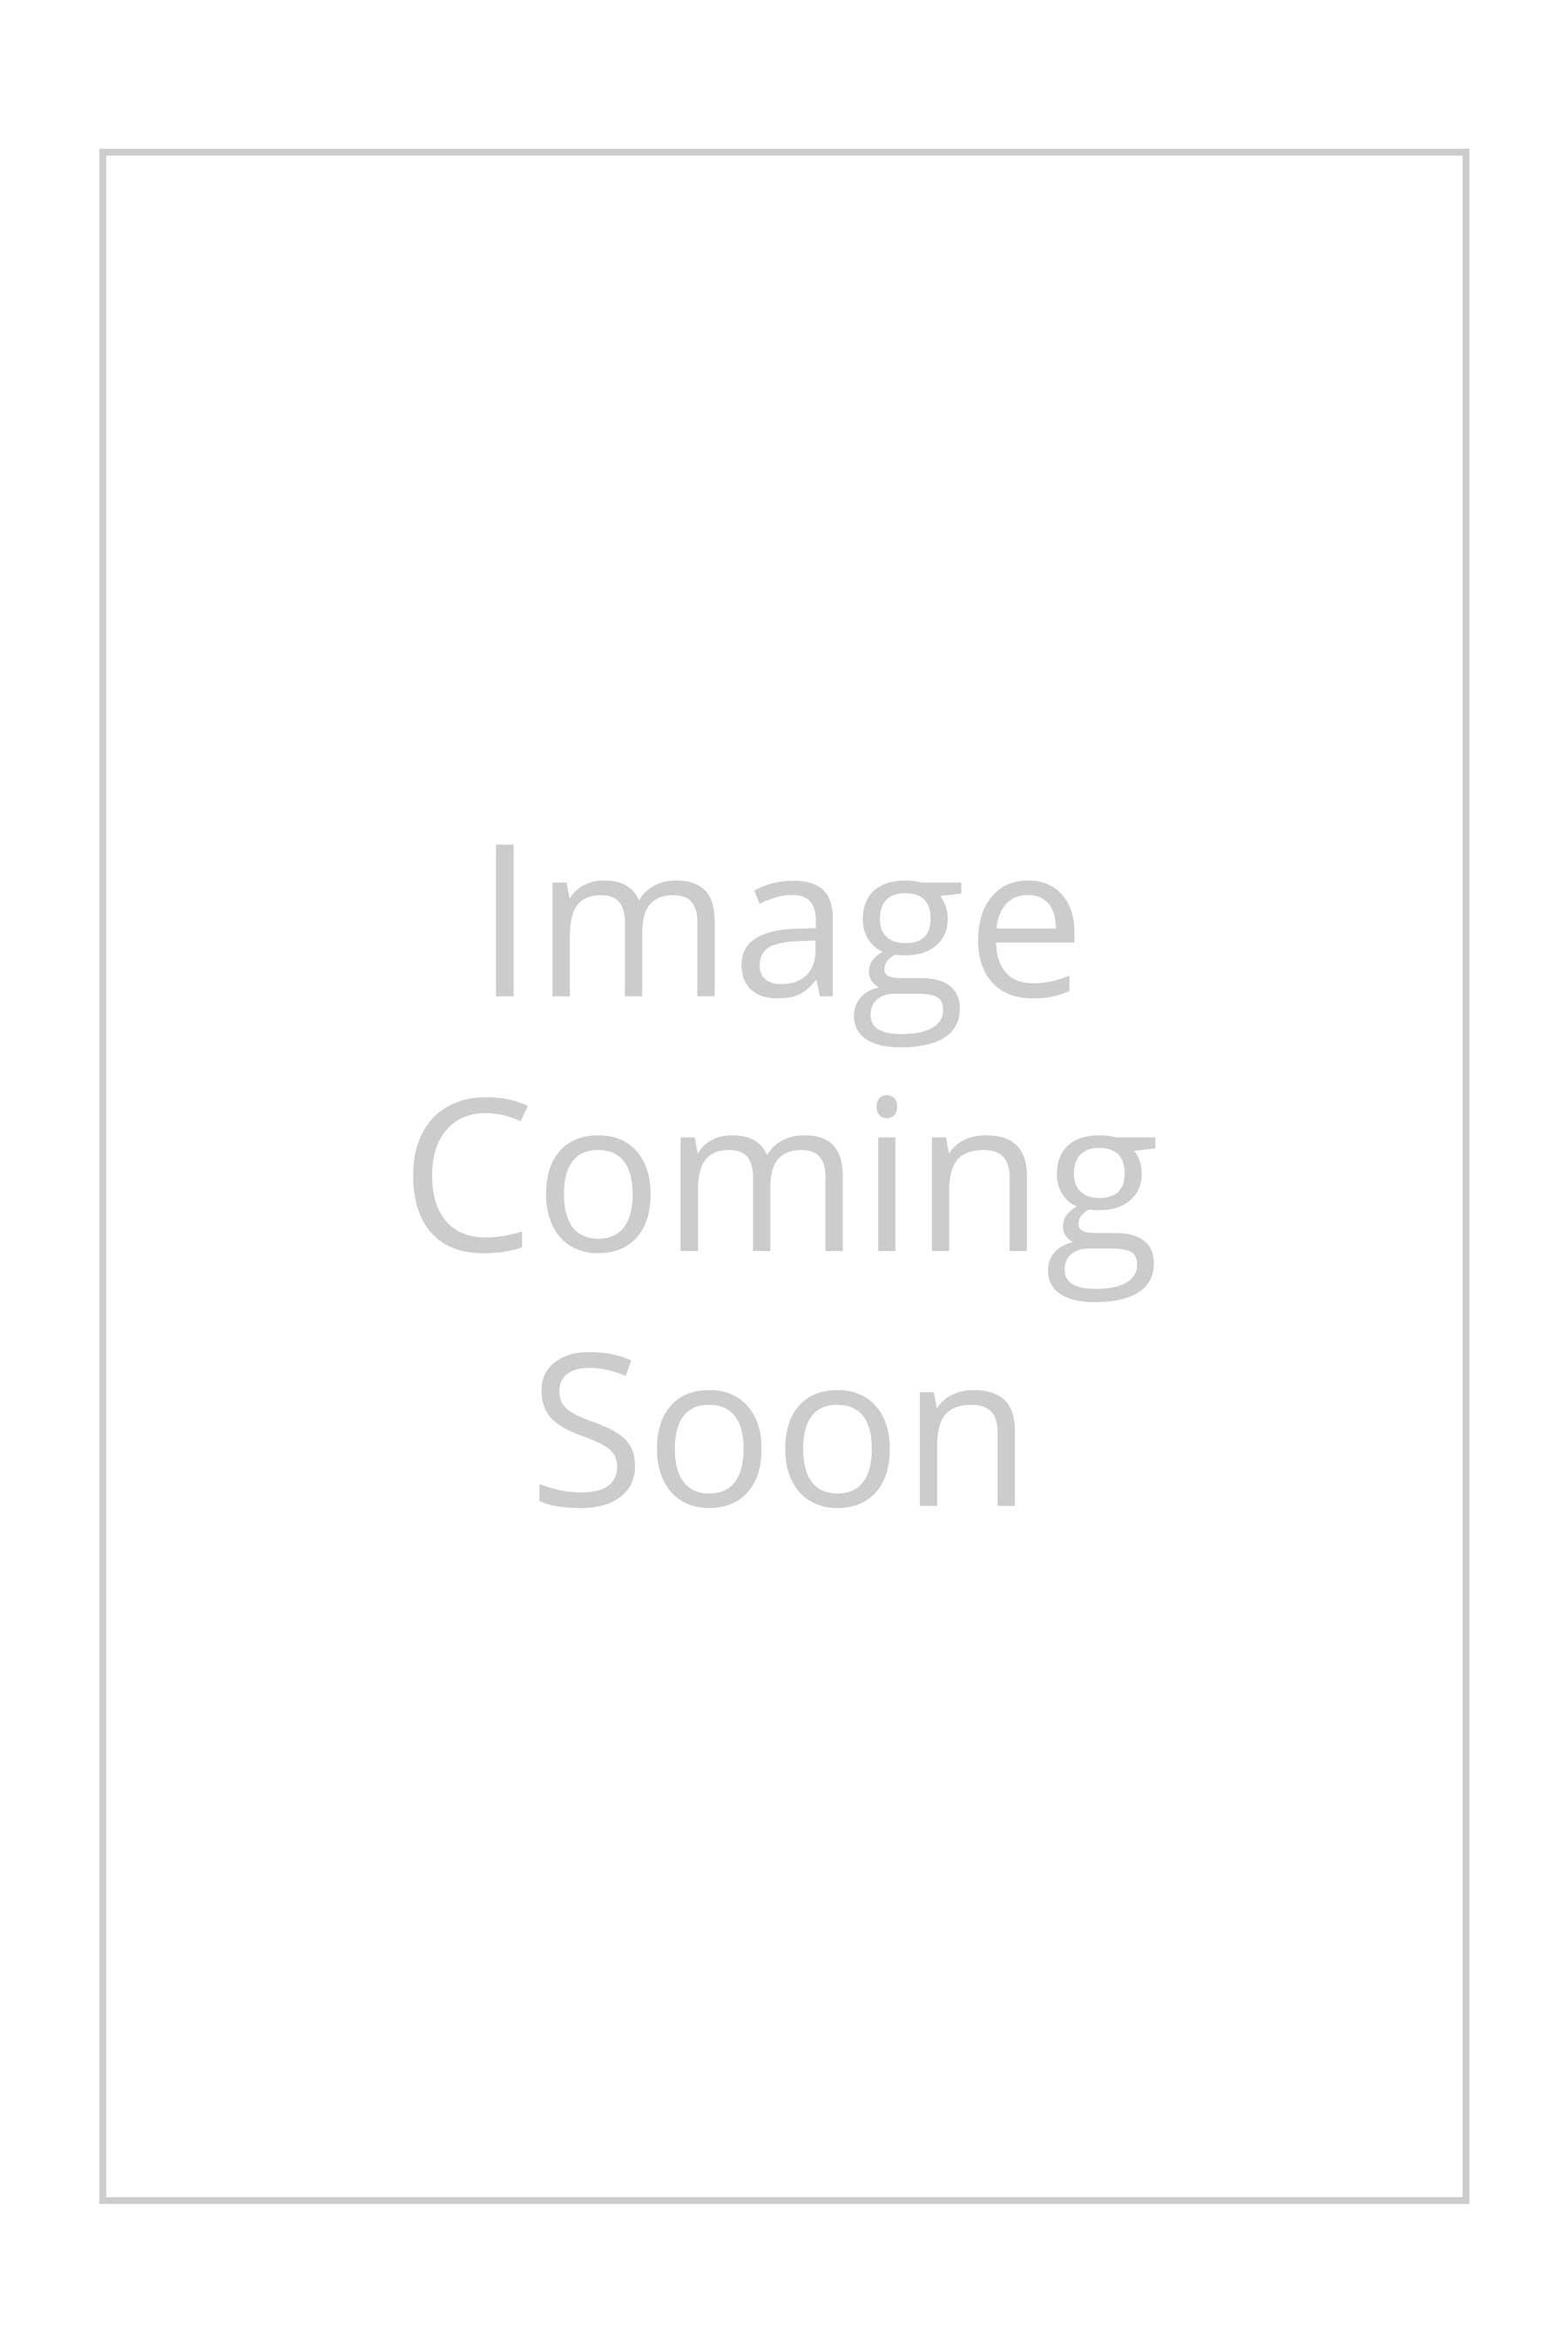 St. John Dark Brown Santana Knit Jacket with Black Faux Suede Trim